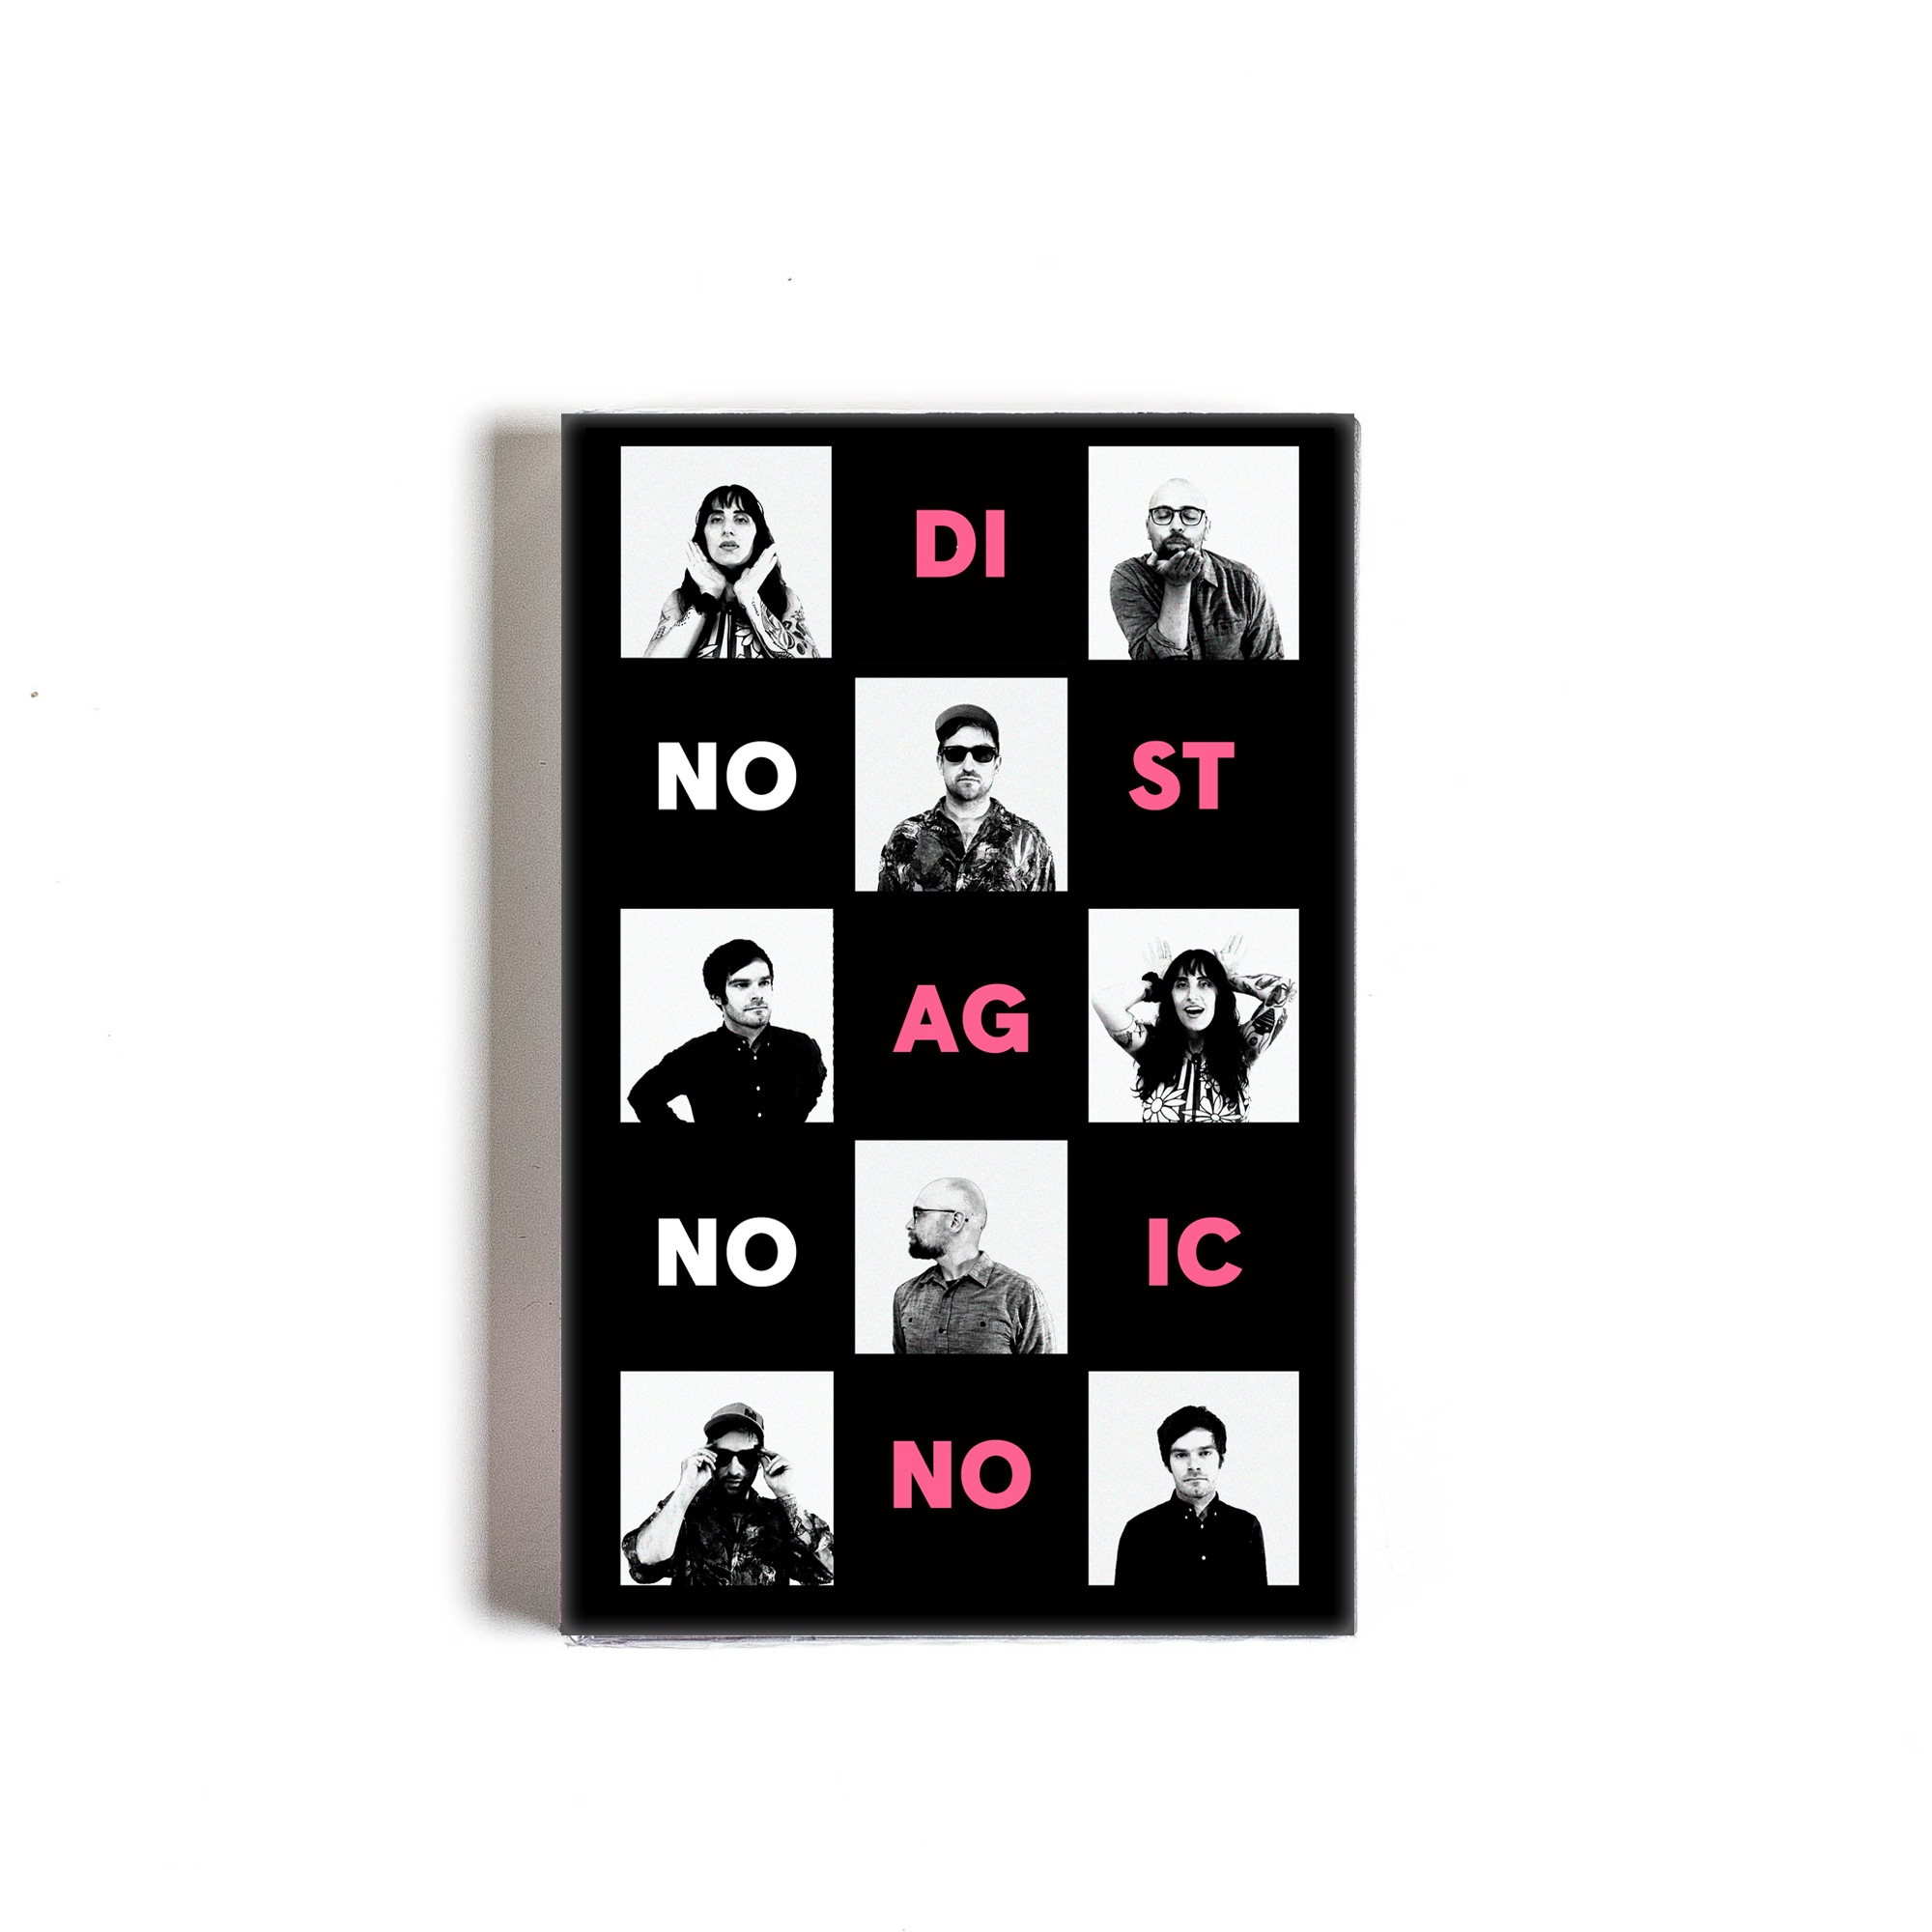 Cassette featuring alternate sleeve design